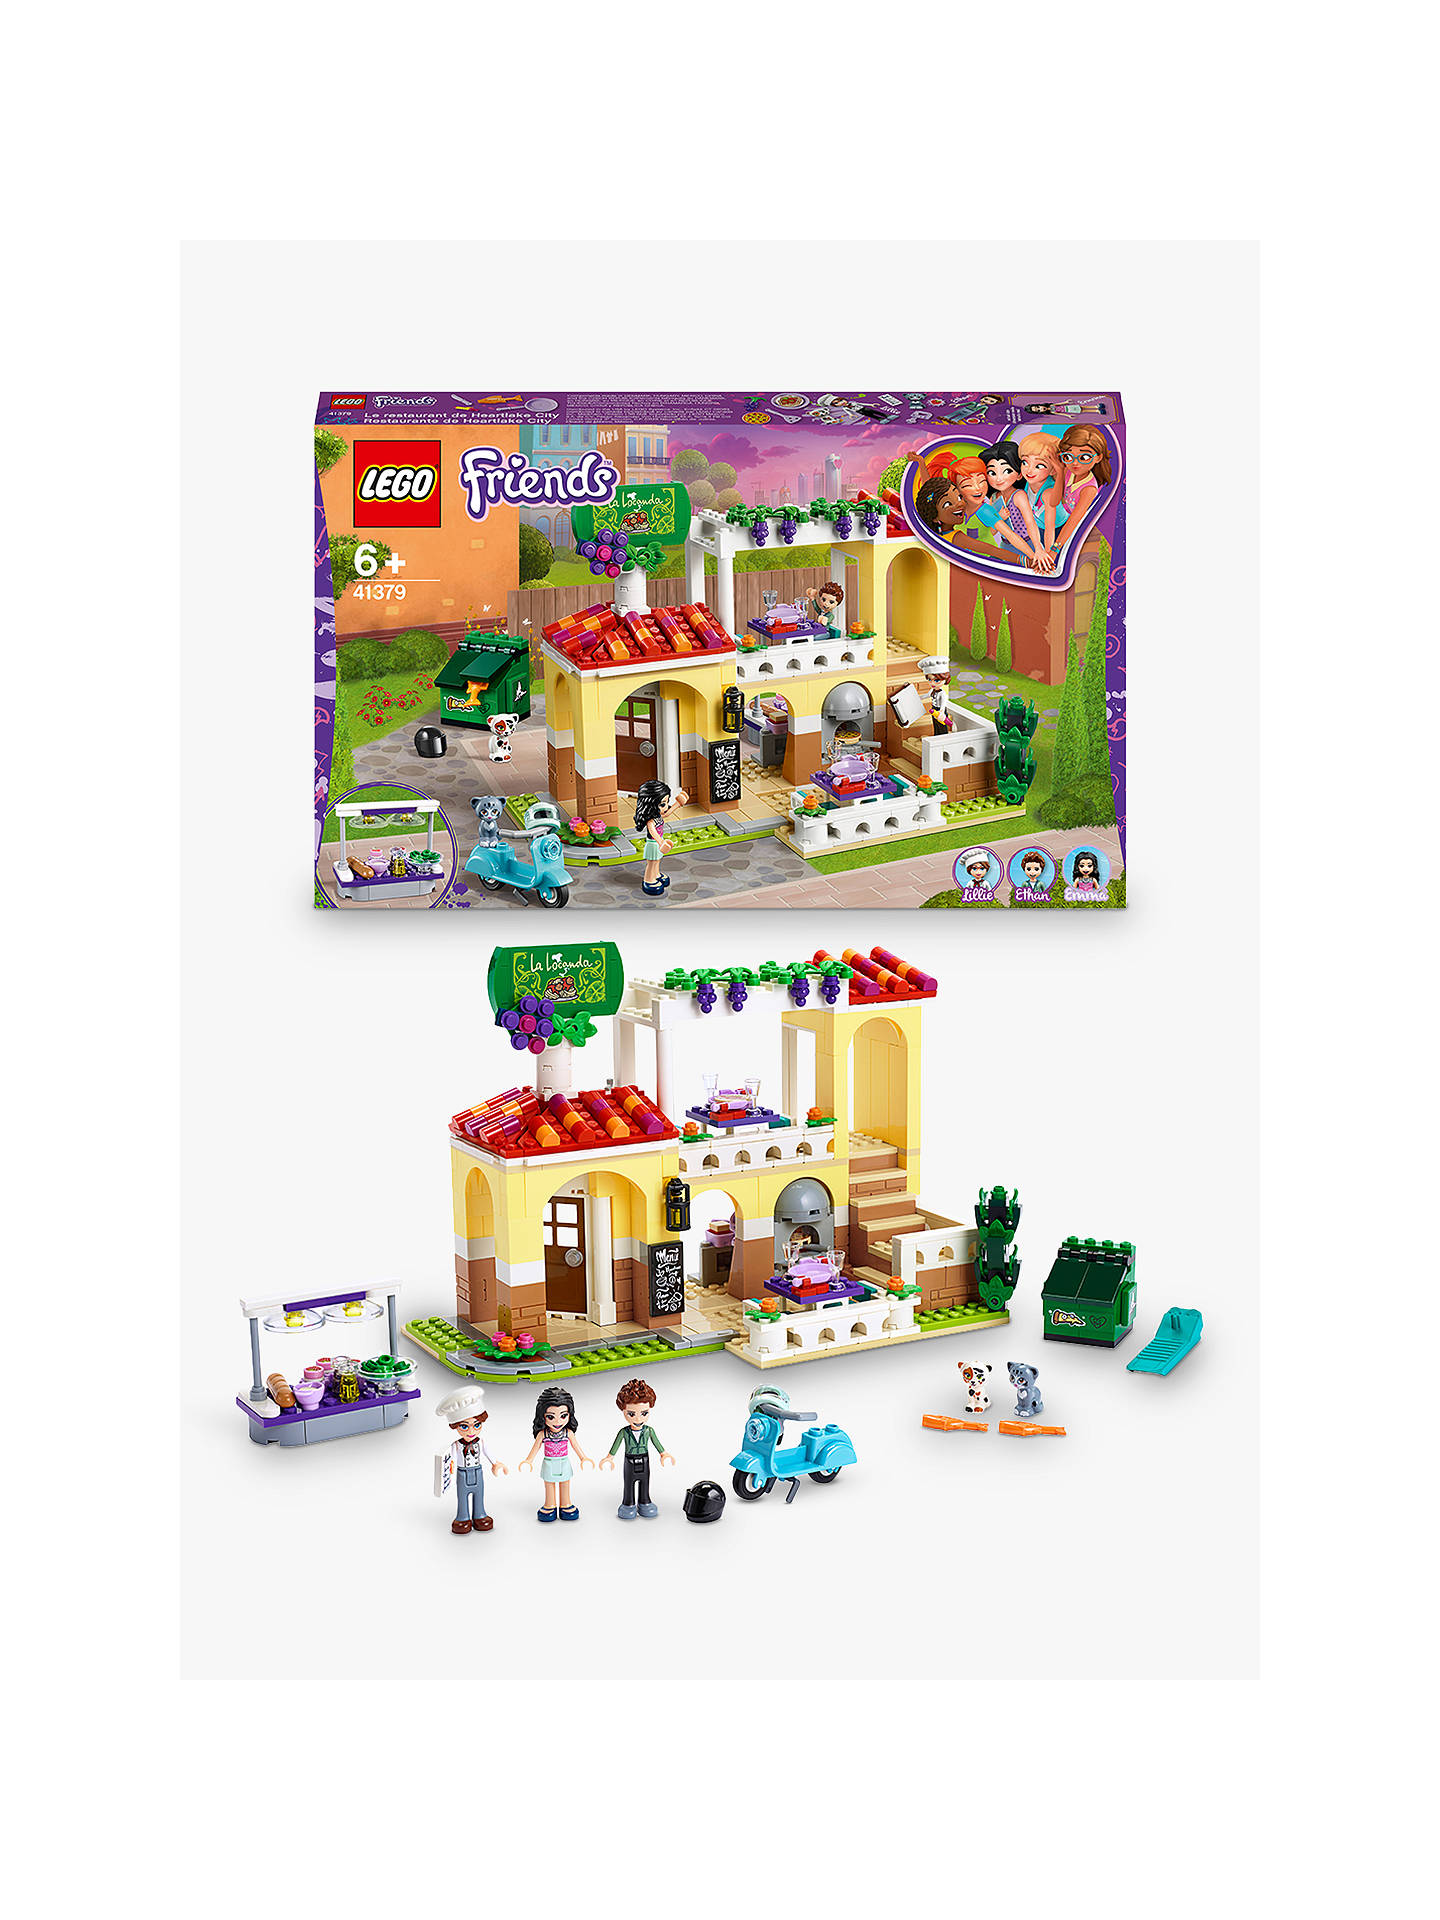 LEGO Friends 41379 Heartlake City Pizzeria Restaurant